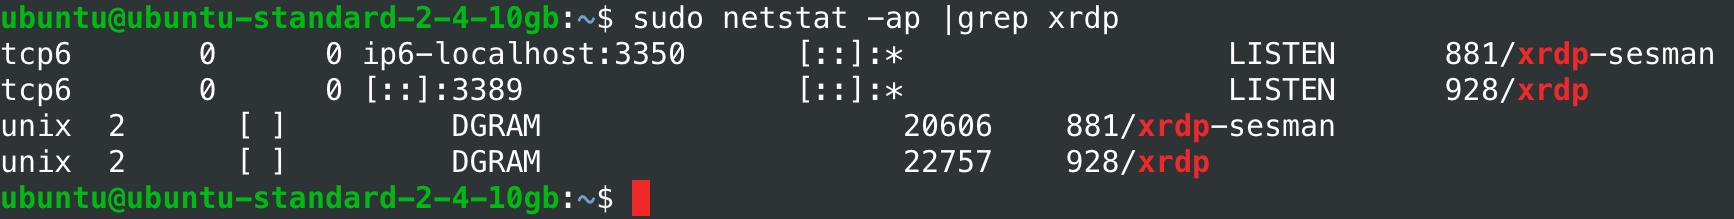 VPS на Linux с графическим интерфейсом: запускаем сервер RDP на Ubuntu 18.04 - 8